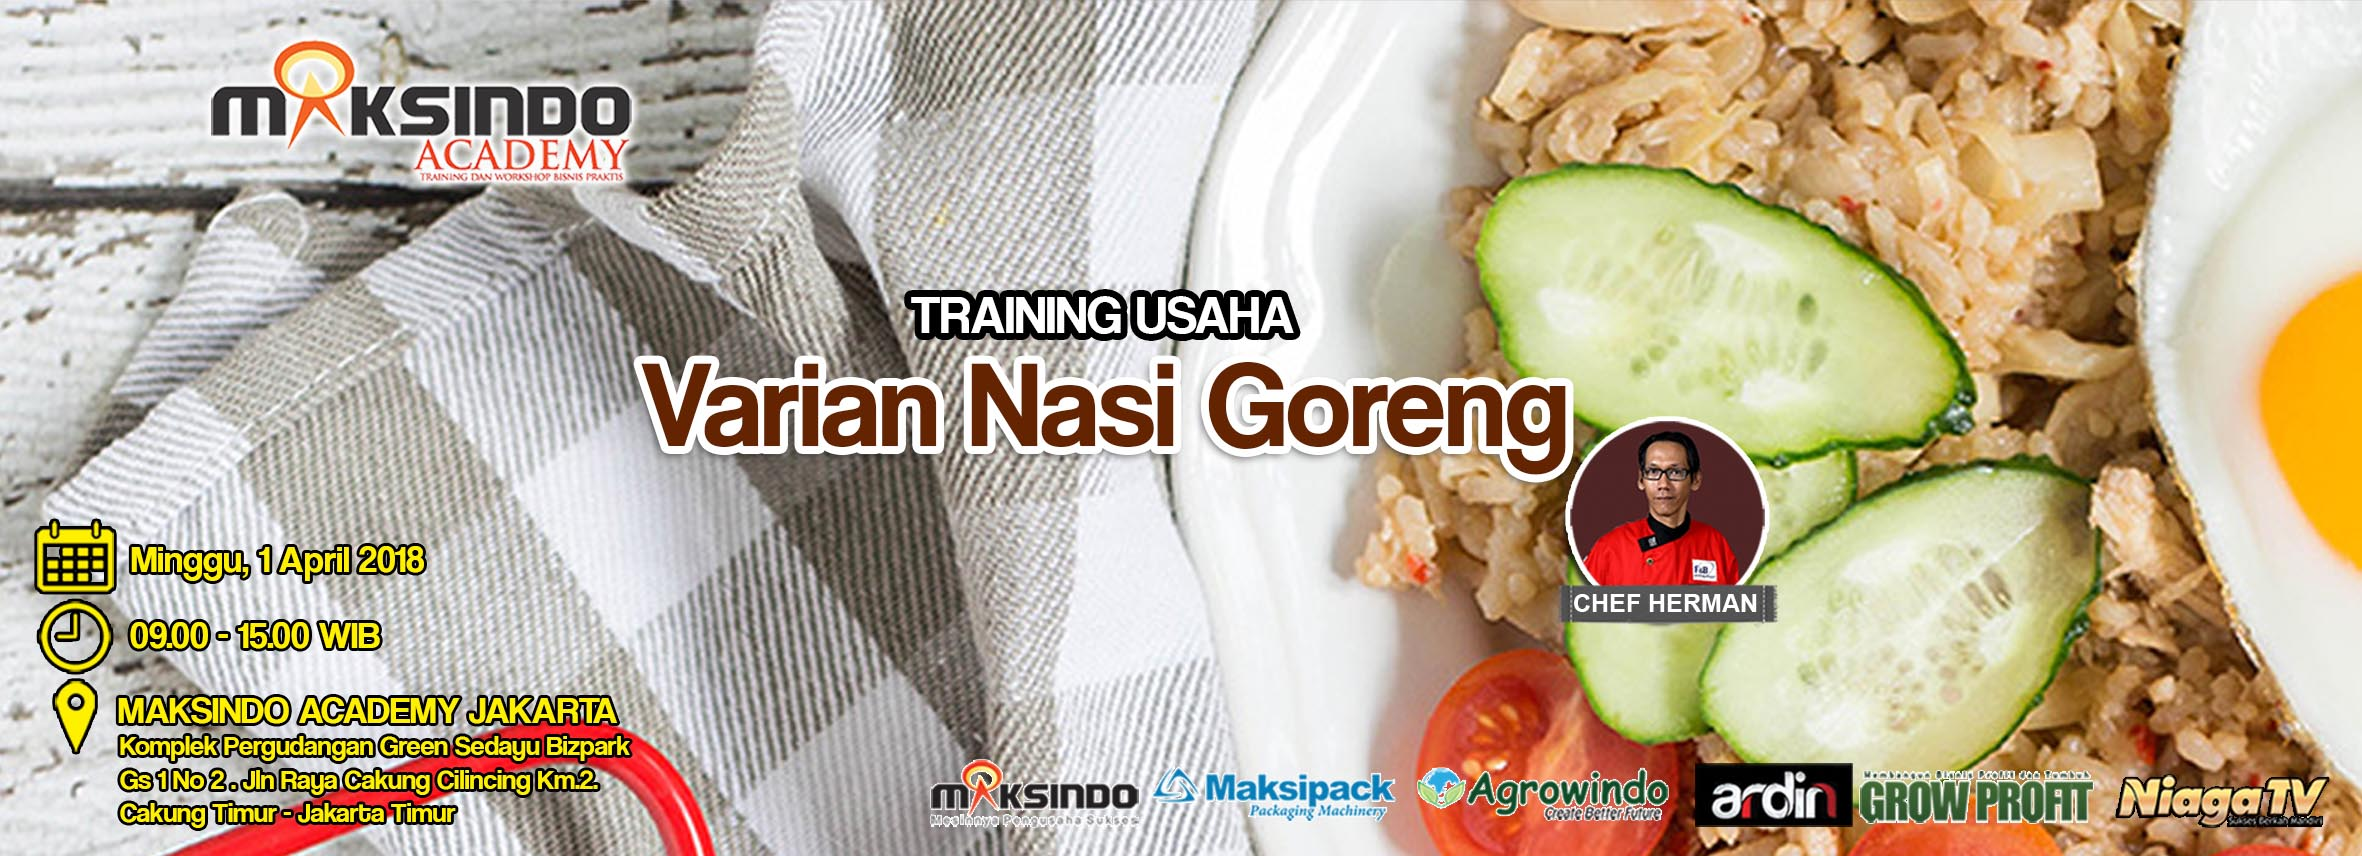 Toko Mesin Maksindo Yogyakarta 4